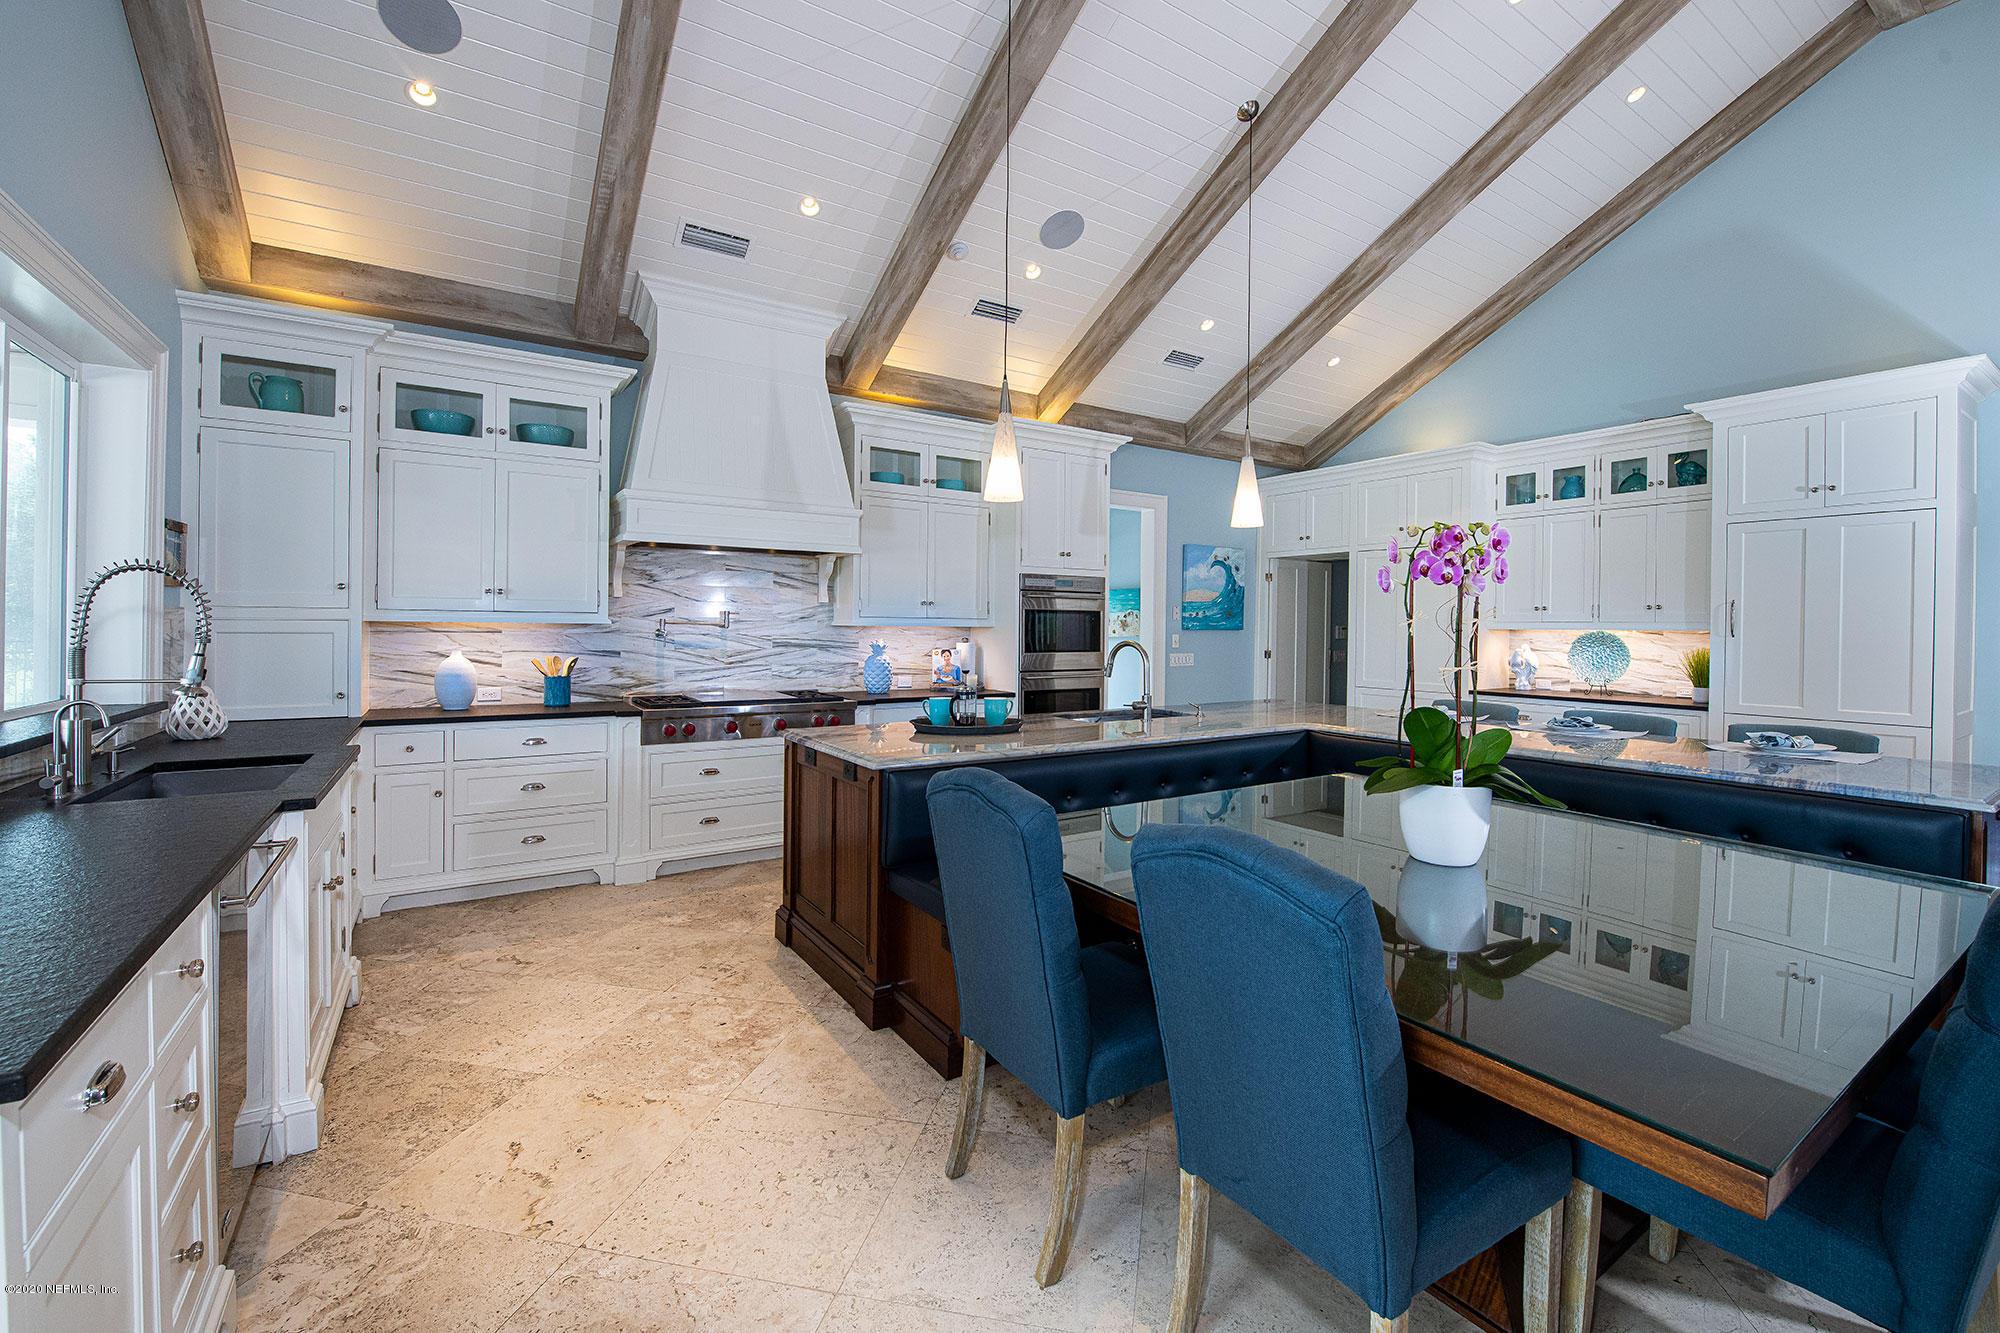 340 PONTE VEDRA, PONTE VEDRA BEACH, FLORIDA 32082, 7 Bedrooms Bedrooms, ,7 BathroomsBathrooms,Residential,For sale,PONTE VEDRA,1082807